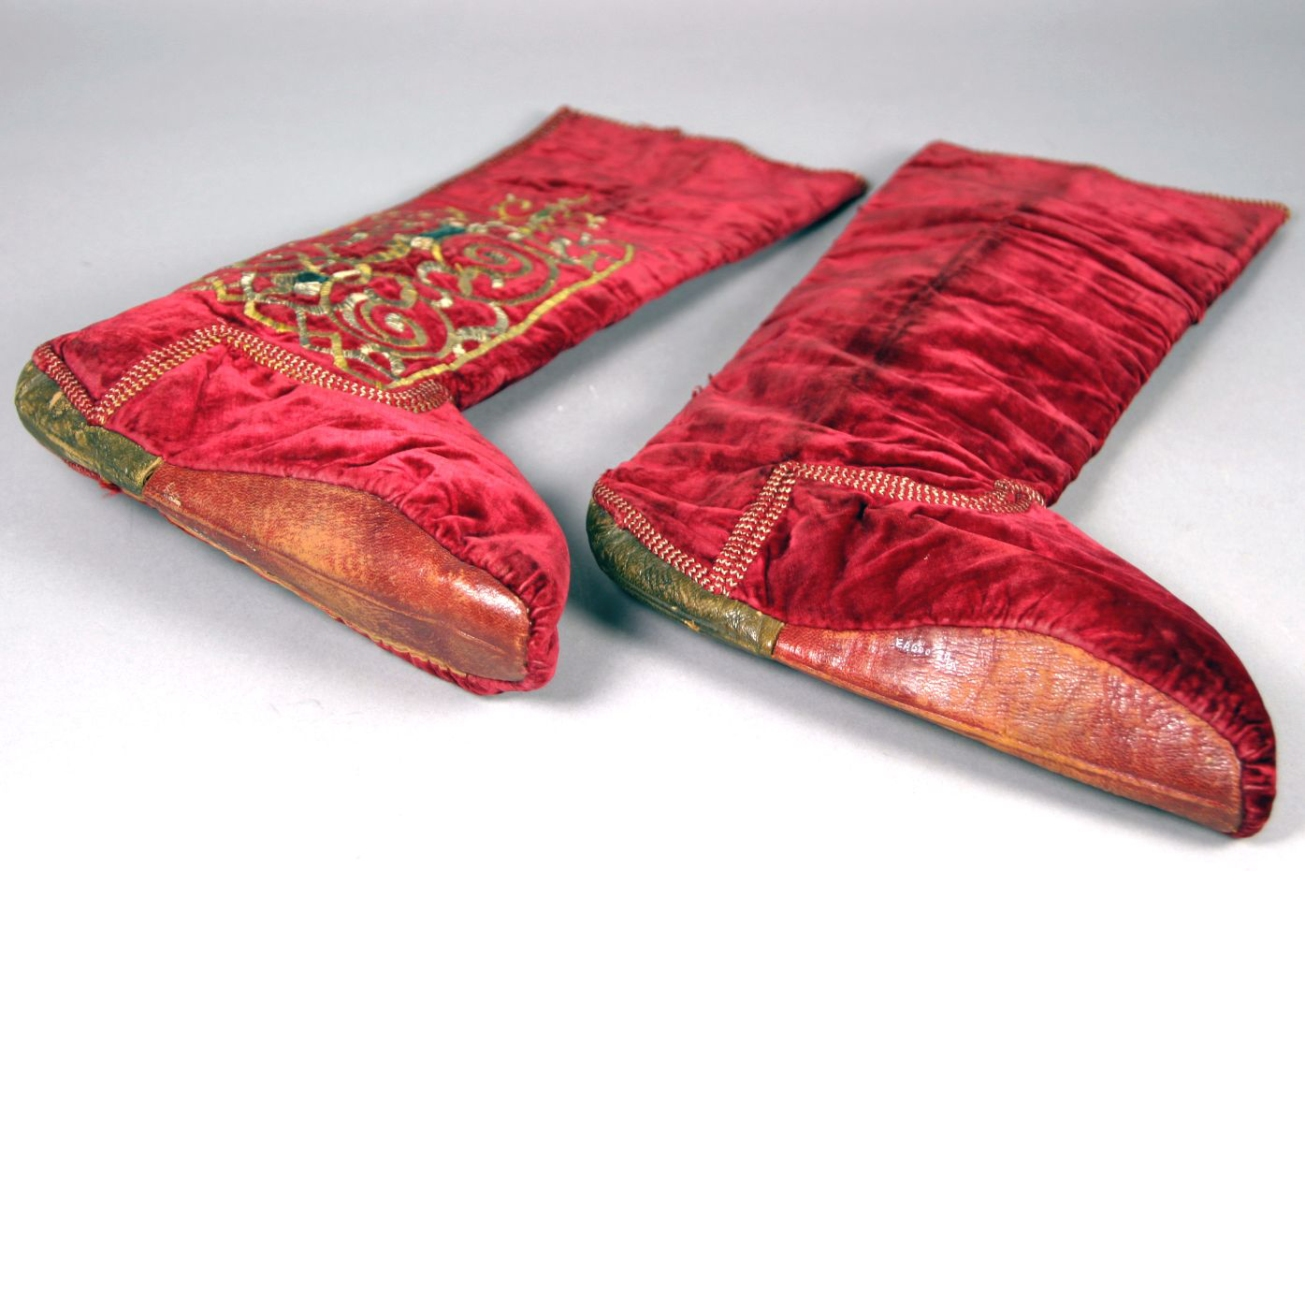 Shoes, moesgaard museum, de etnografiske samlinger, ethnography, collections, museum, aarhus, denmark